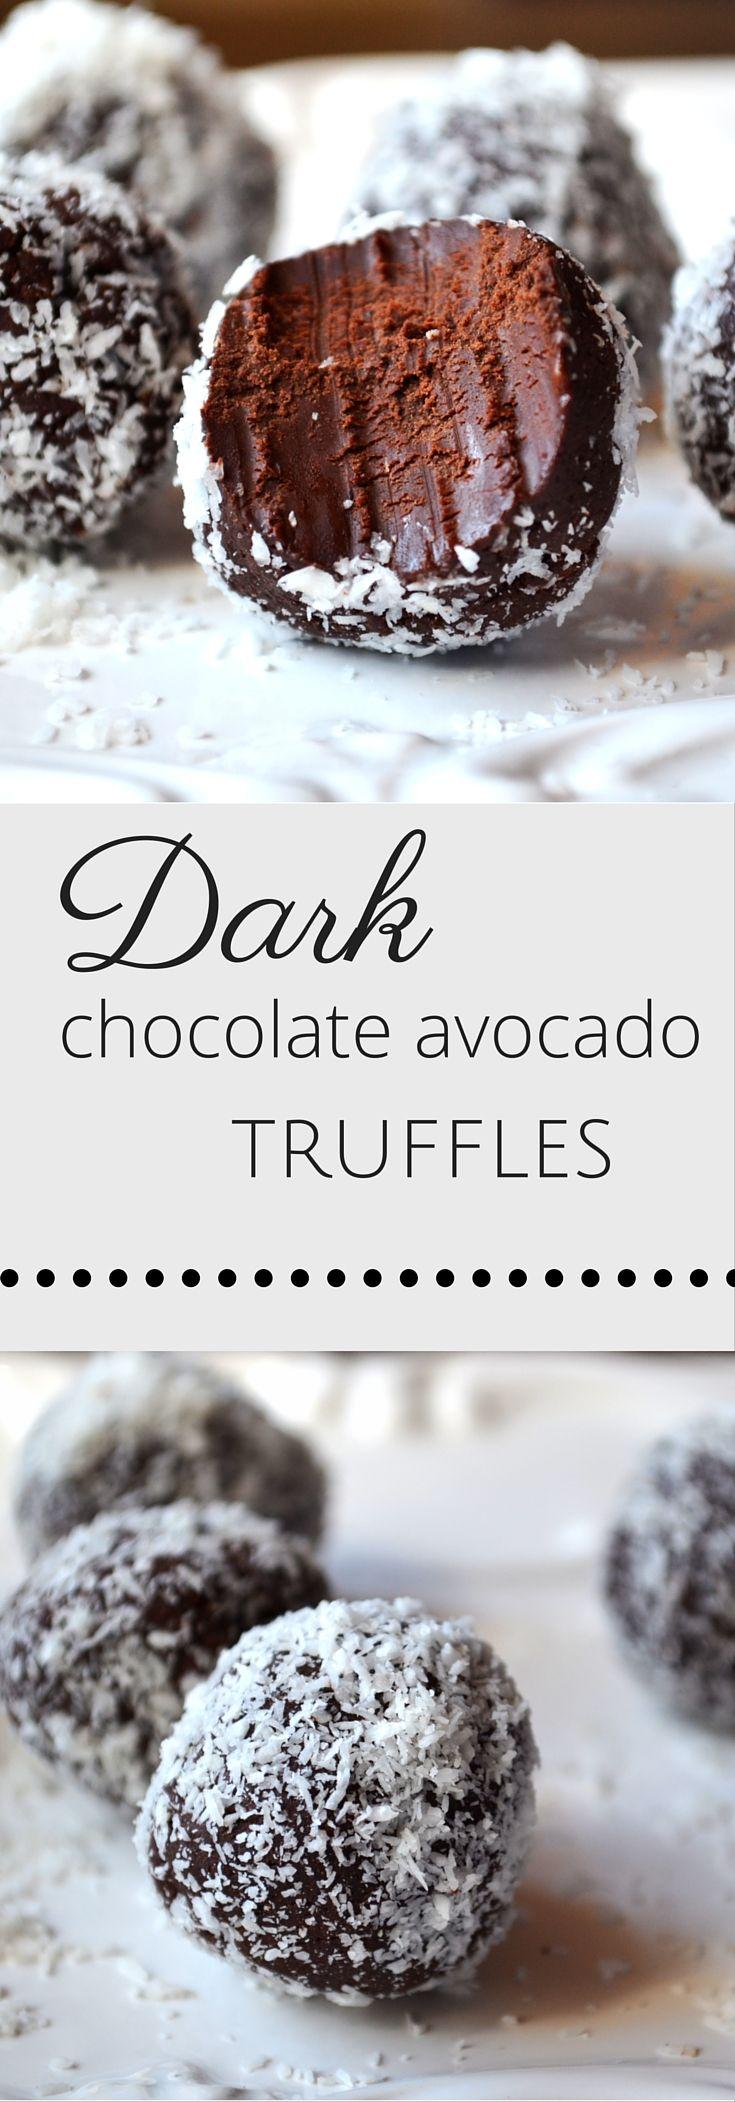 Dark chocolate avocado truffles. You will LOVE these. An intense chocolate hit minus the guilt. Insidetherustickitchen.com